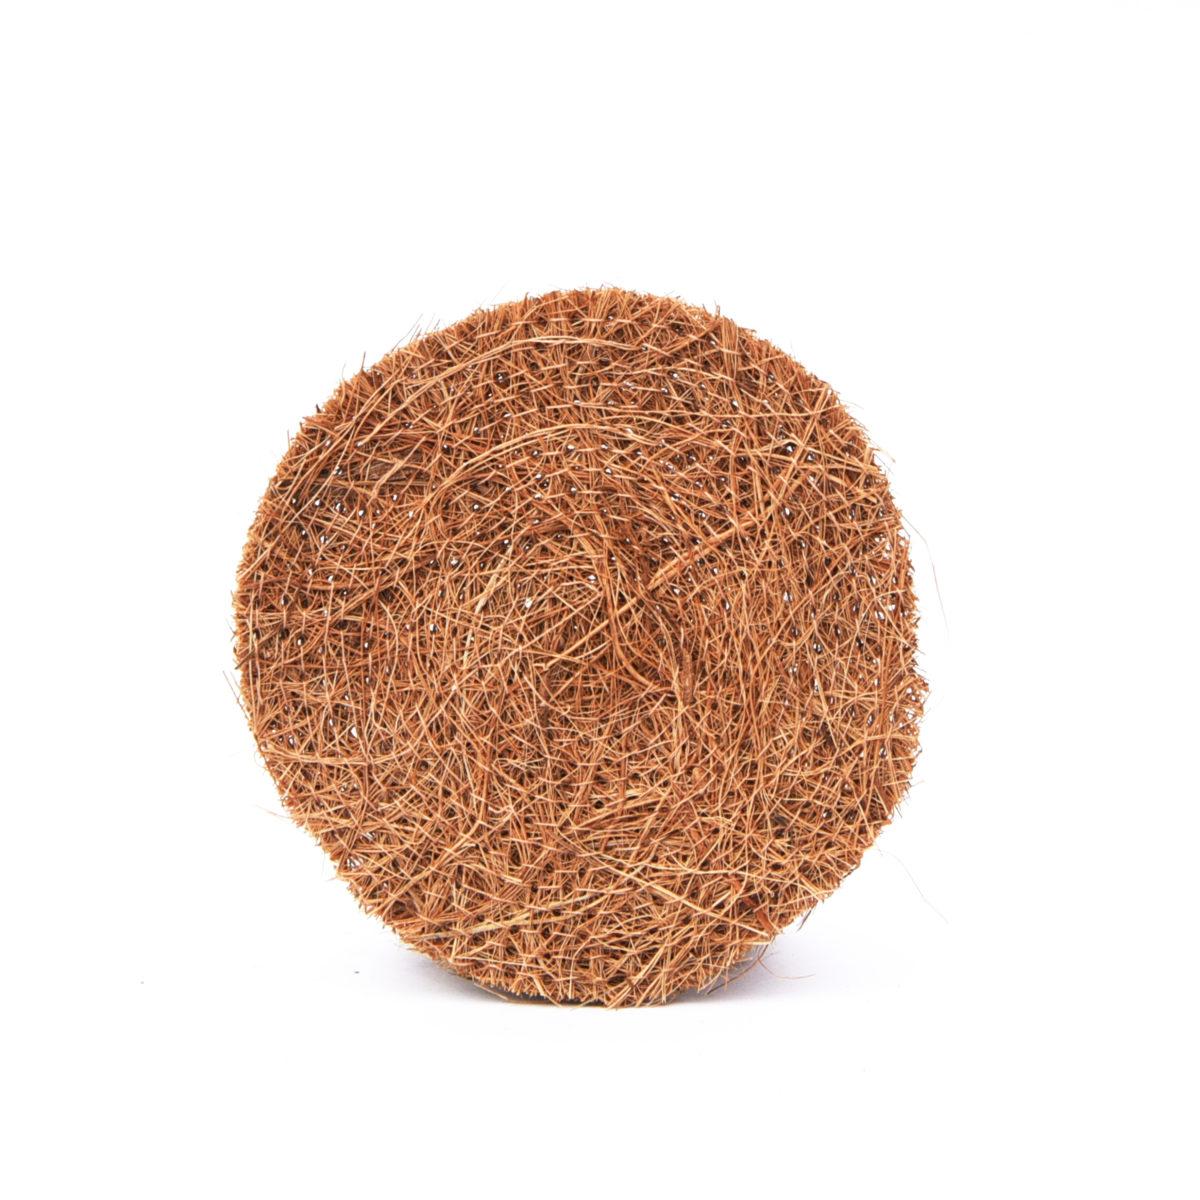 Coconut Fiber Scrub - Set of 10